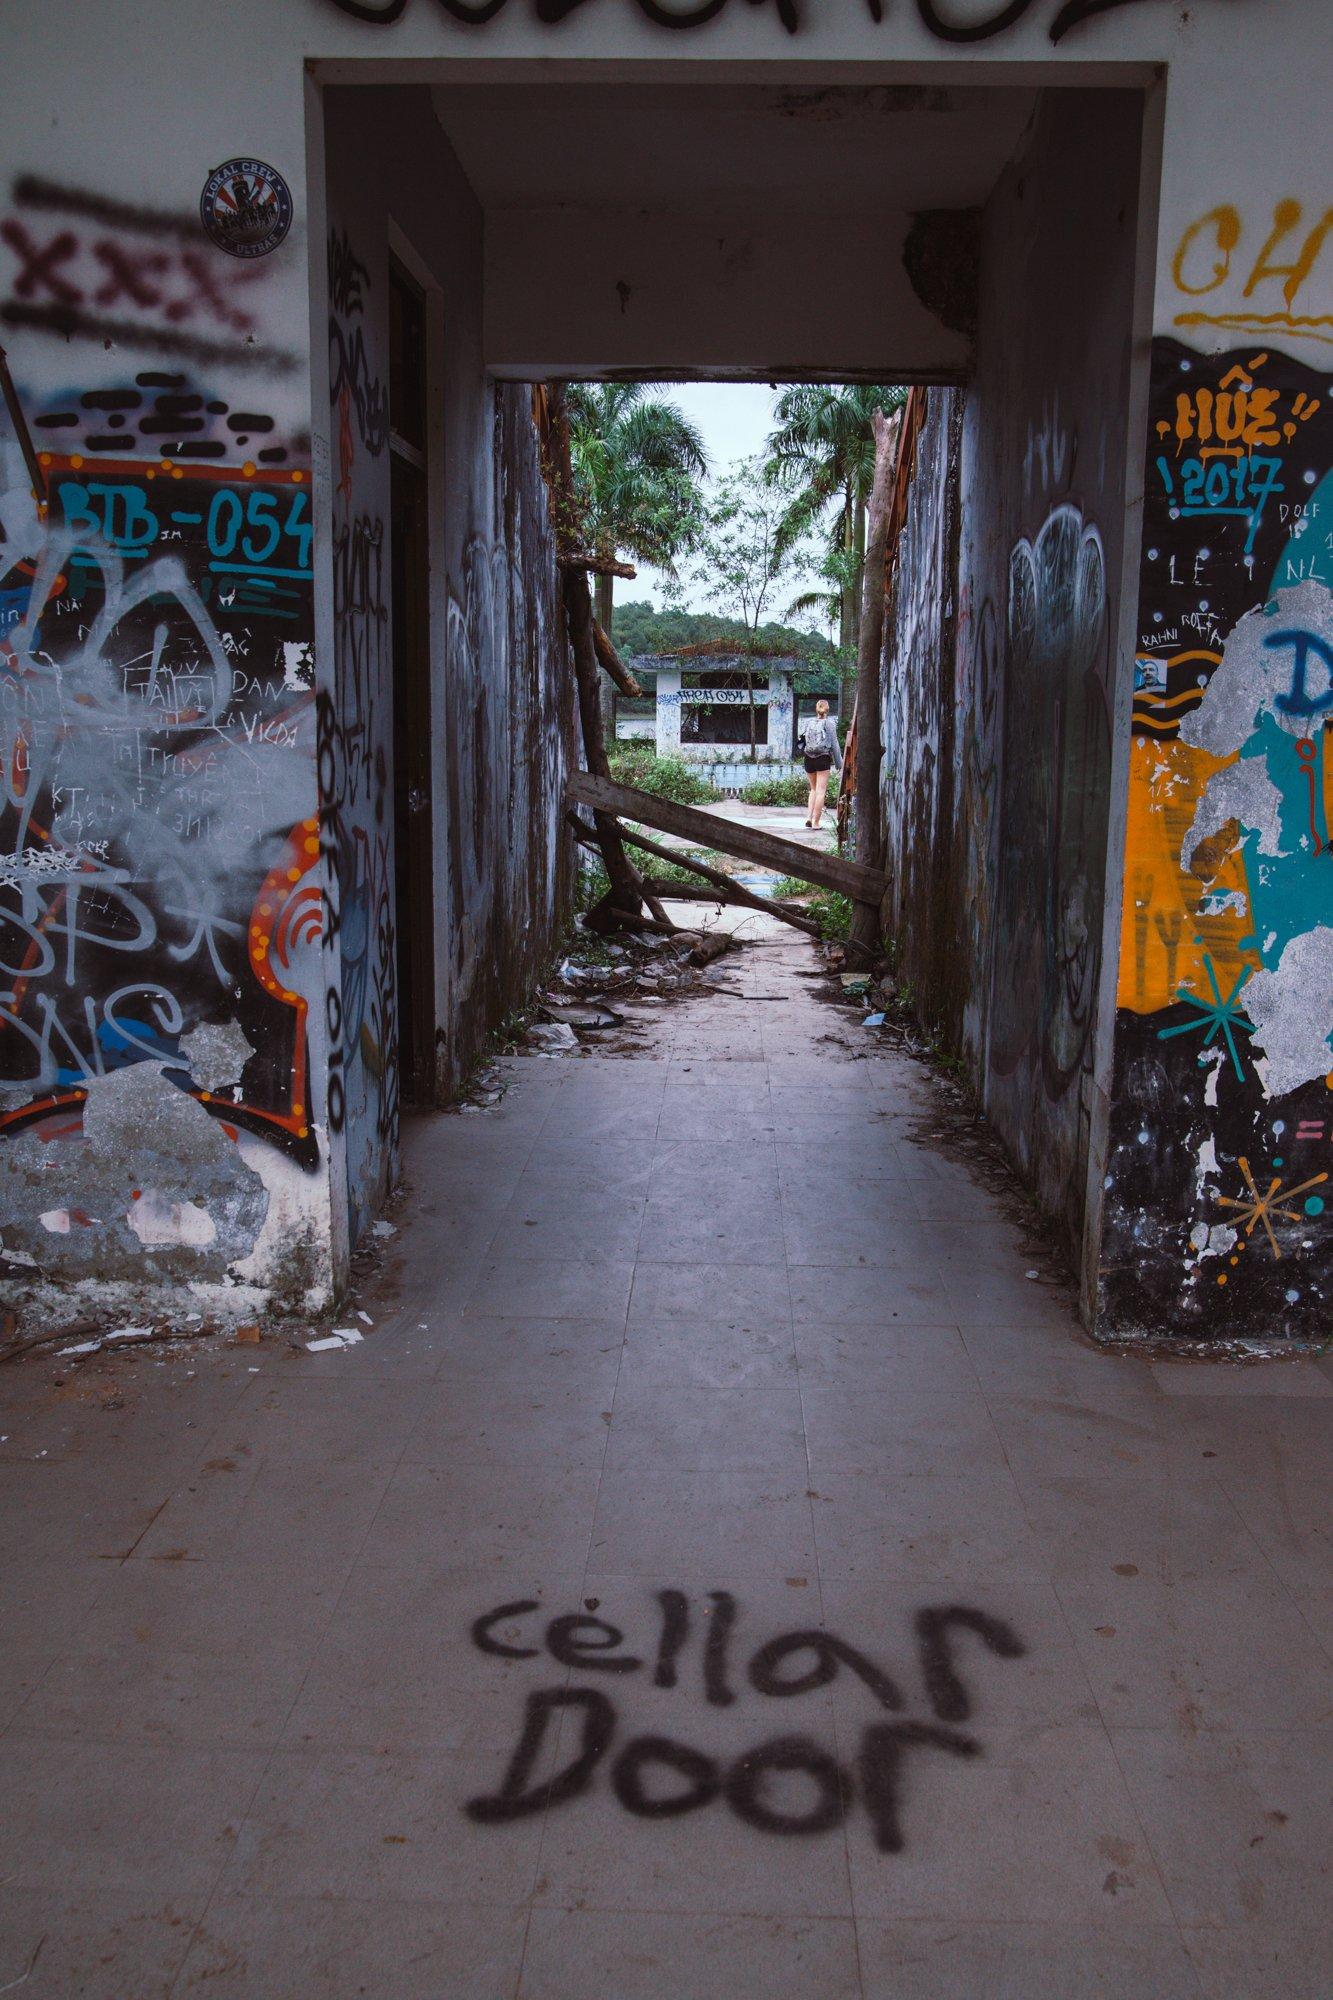 Cellar Door graffiti at the abandoned waterpark in Hue